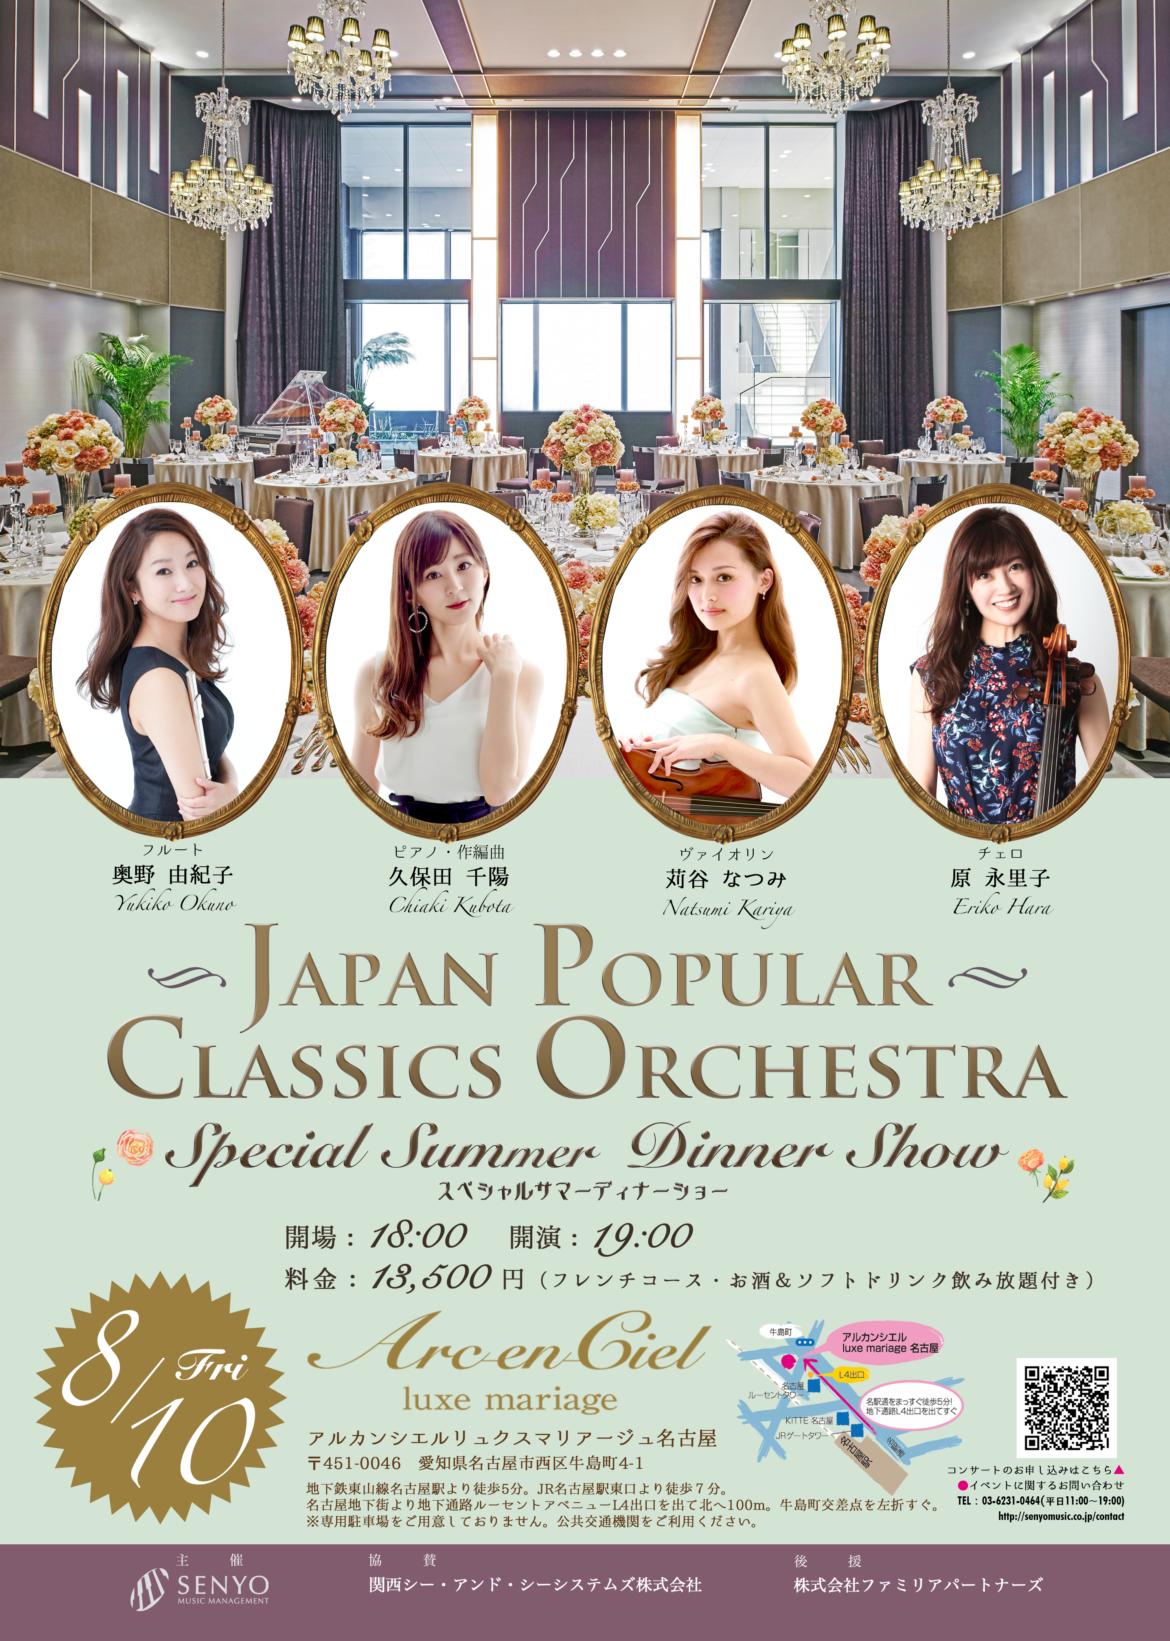 2018.8.10 JPCO スペシャル・サマーディナーショー in 名古屋